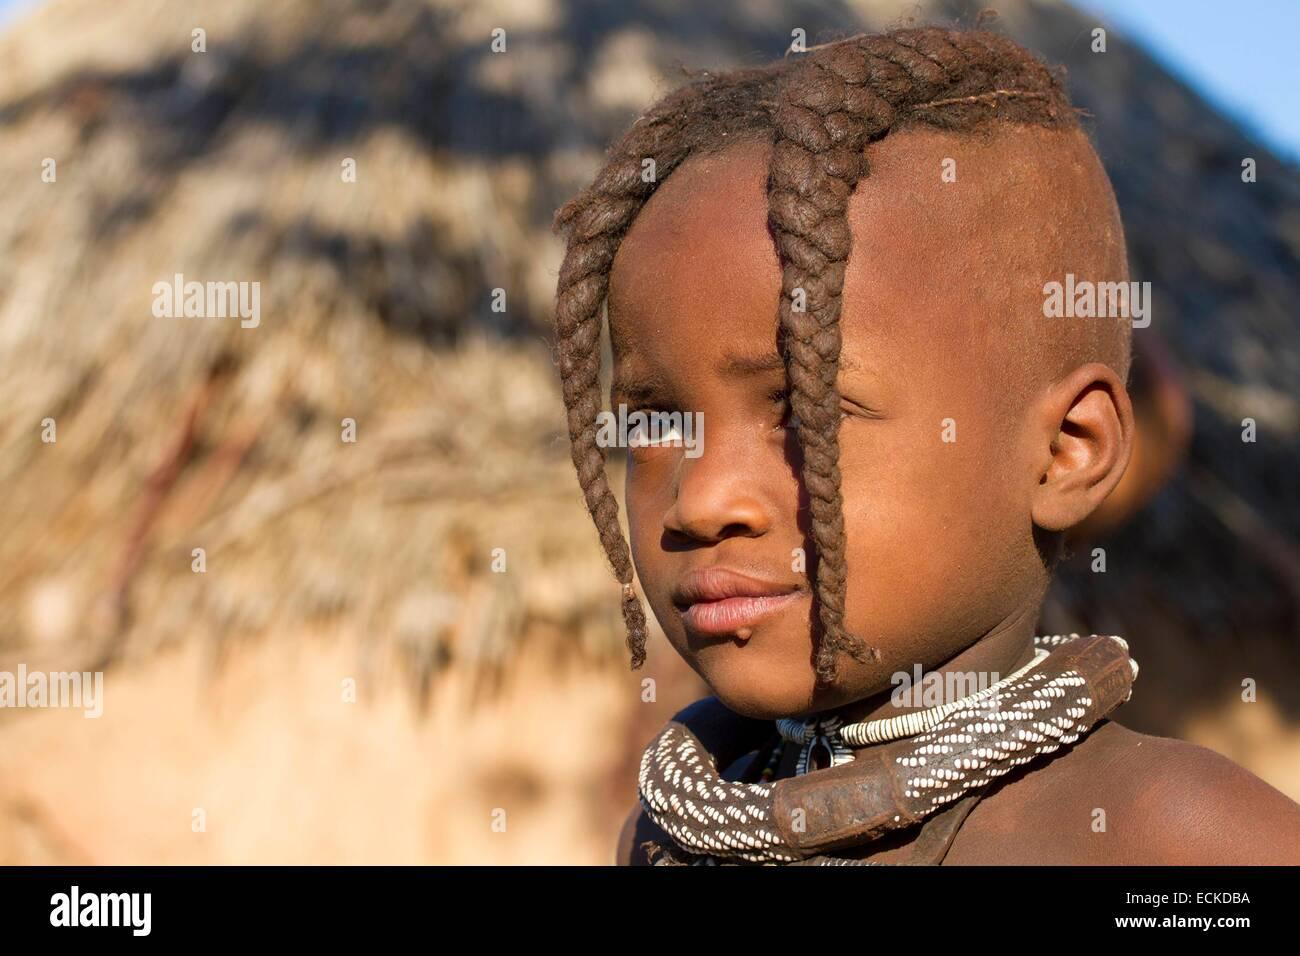 Namibia, Kunene region, Kaokoland, Himba village near Opuwo, Himba girl Stock Photo